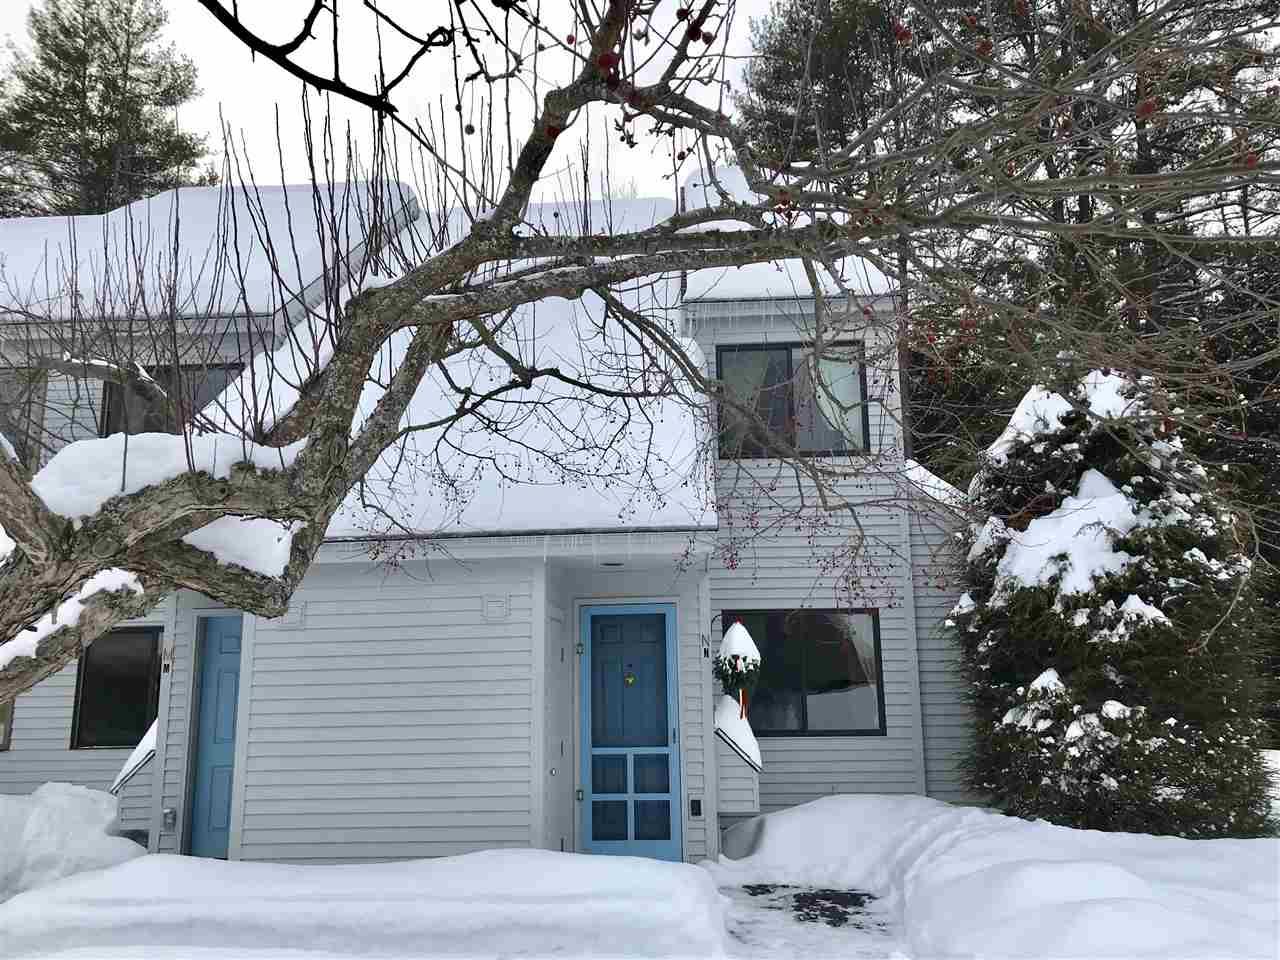 VILLAGE OF WILDER IN TOWN OF HARTFORD VTCondo for sale $$124,900 | $119 per sq.ft.